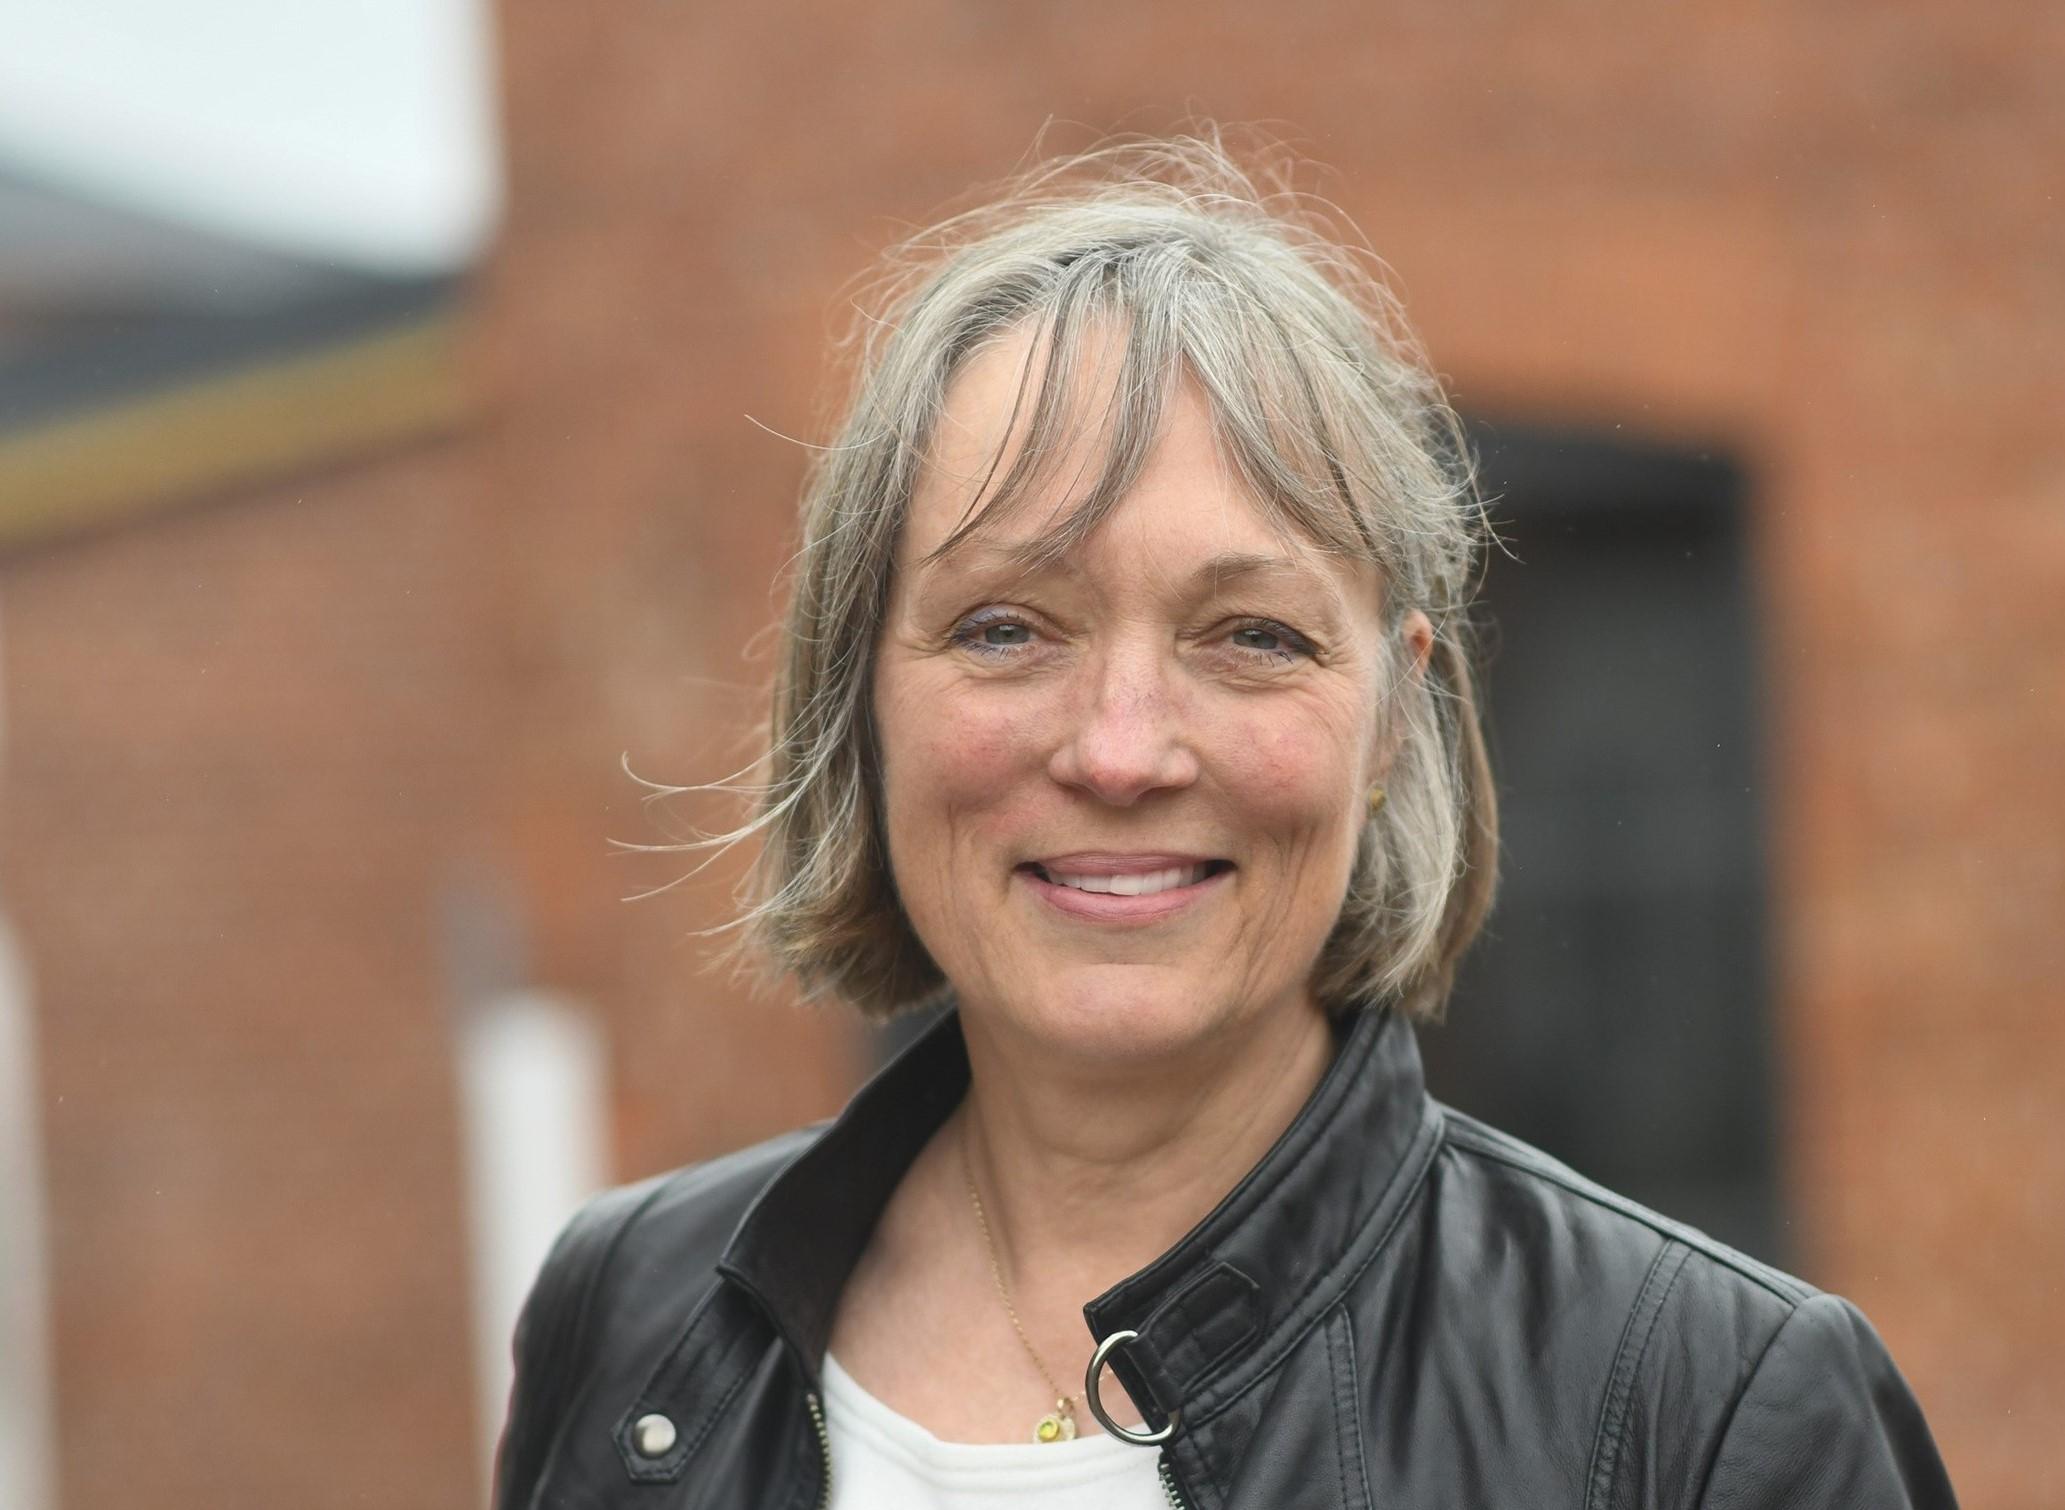 Lisbeth Holm Clausen